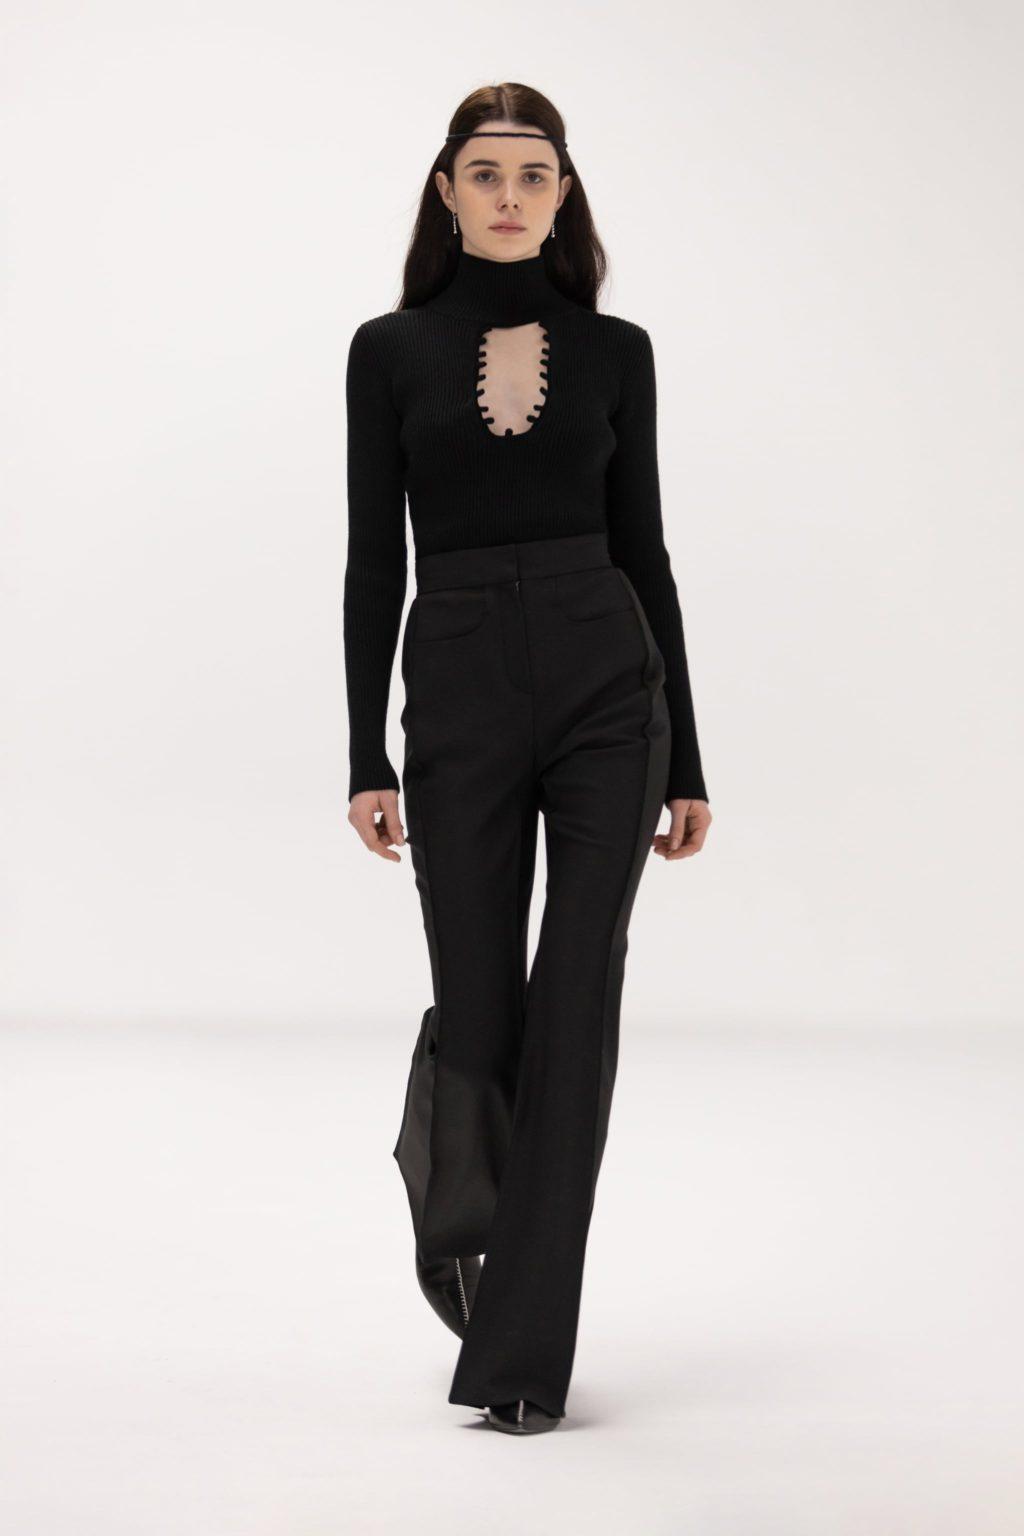 Bevza-2021.-1024x1536 Top 10 Fashion Brands Rising in 2021